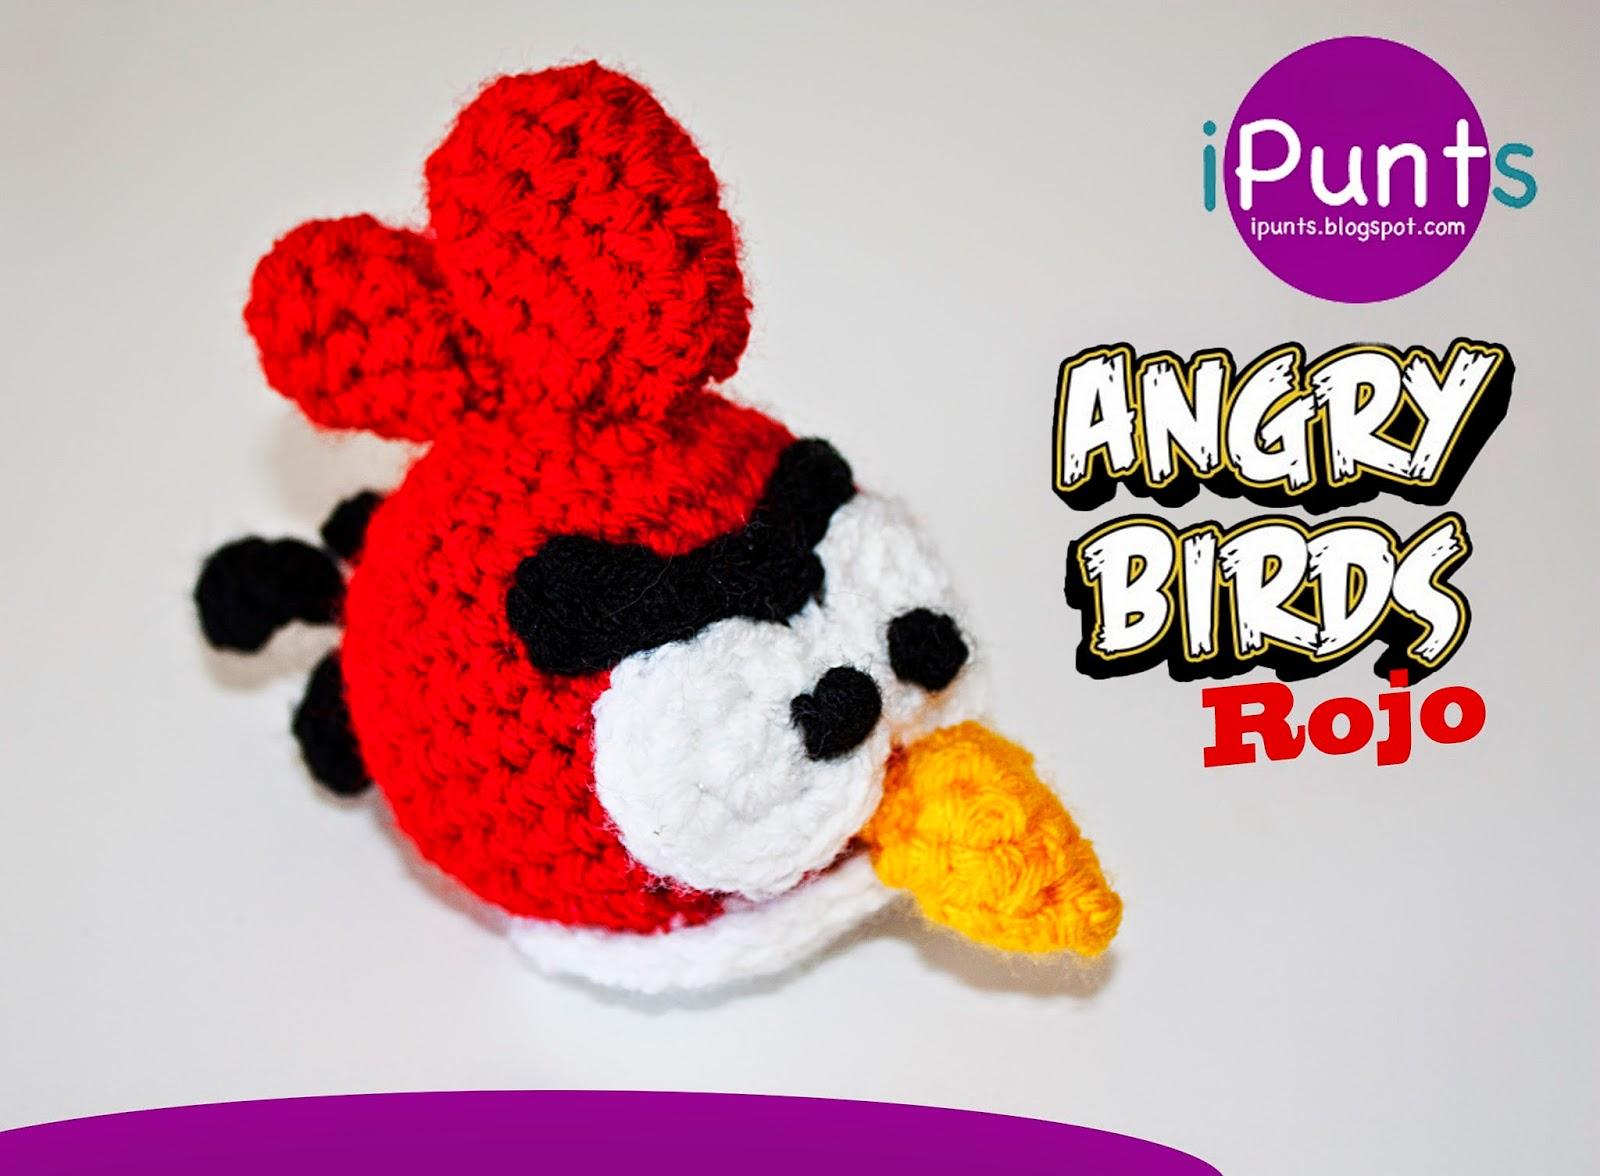 Angry Birds rojo amigurumi corchet ganchillo patron gratis ipunts